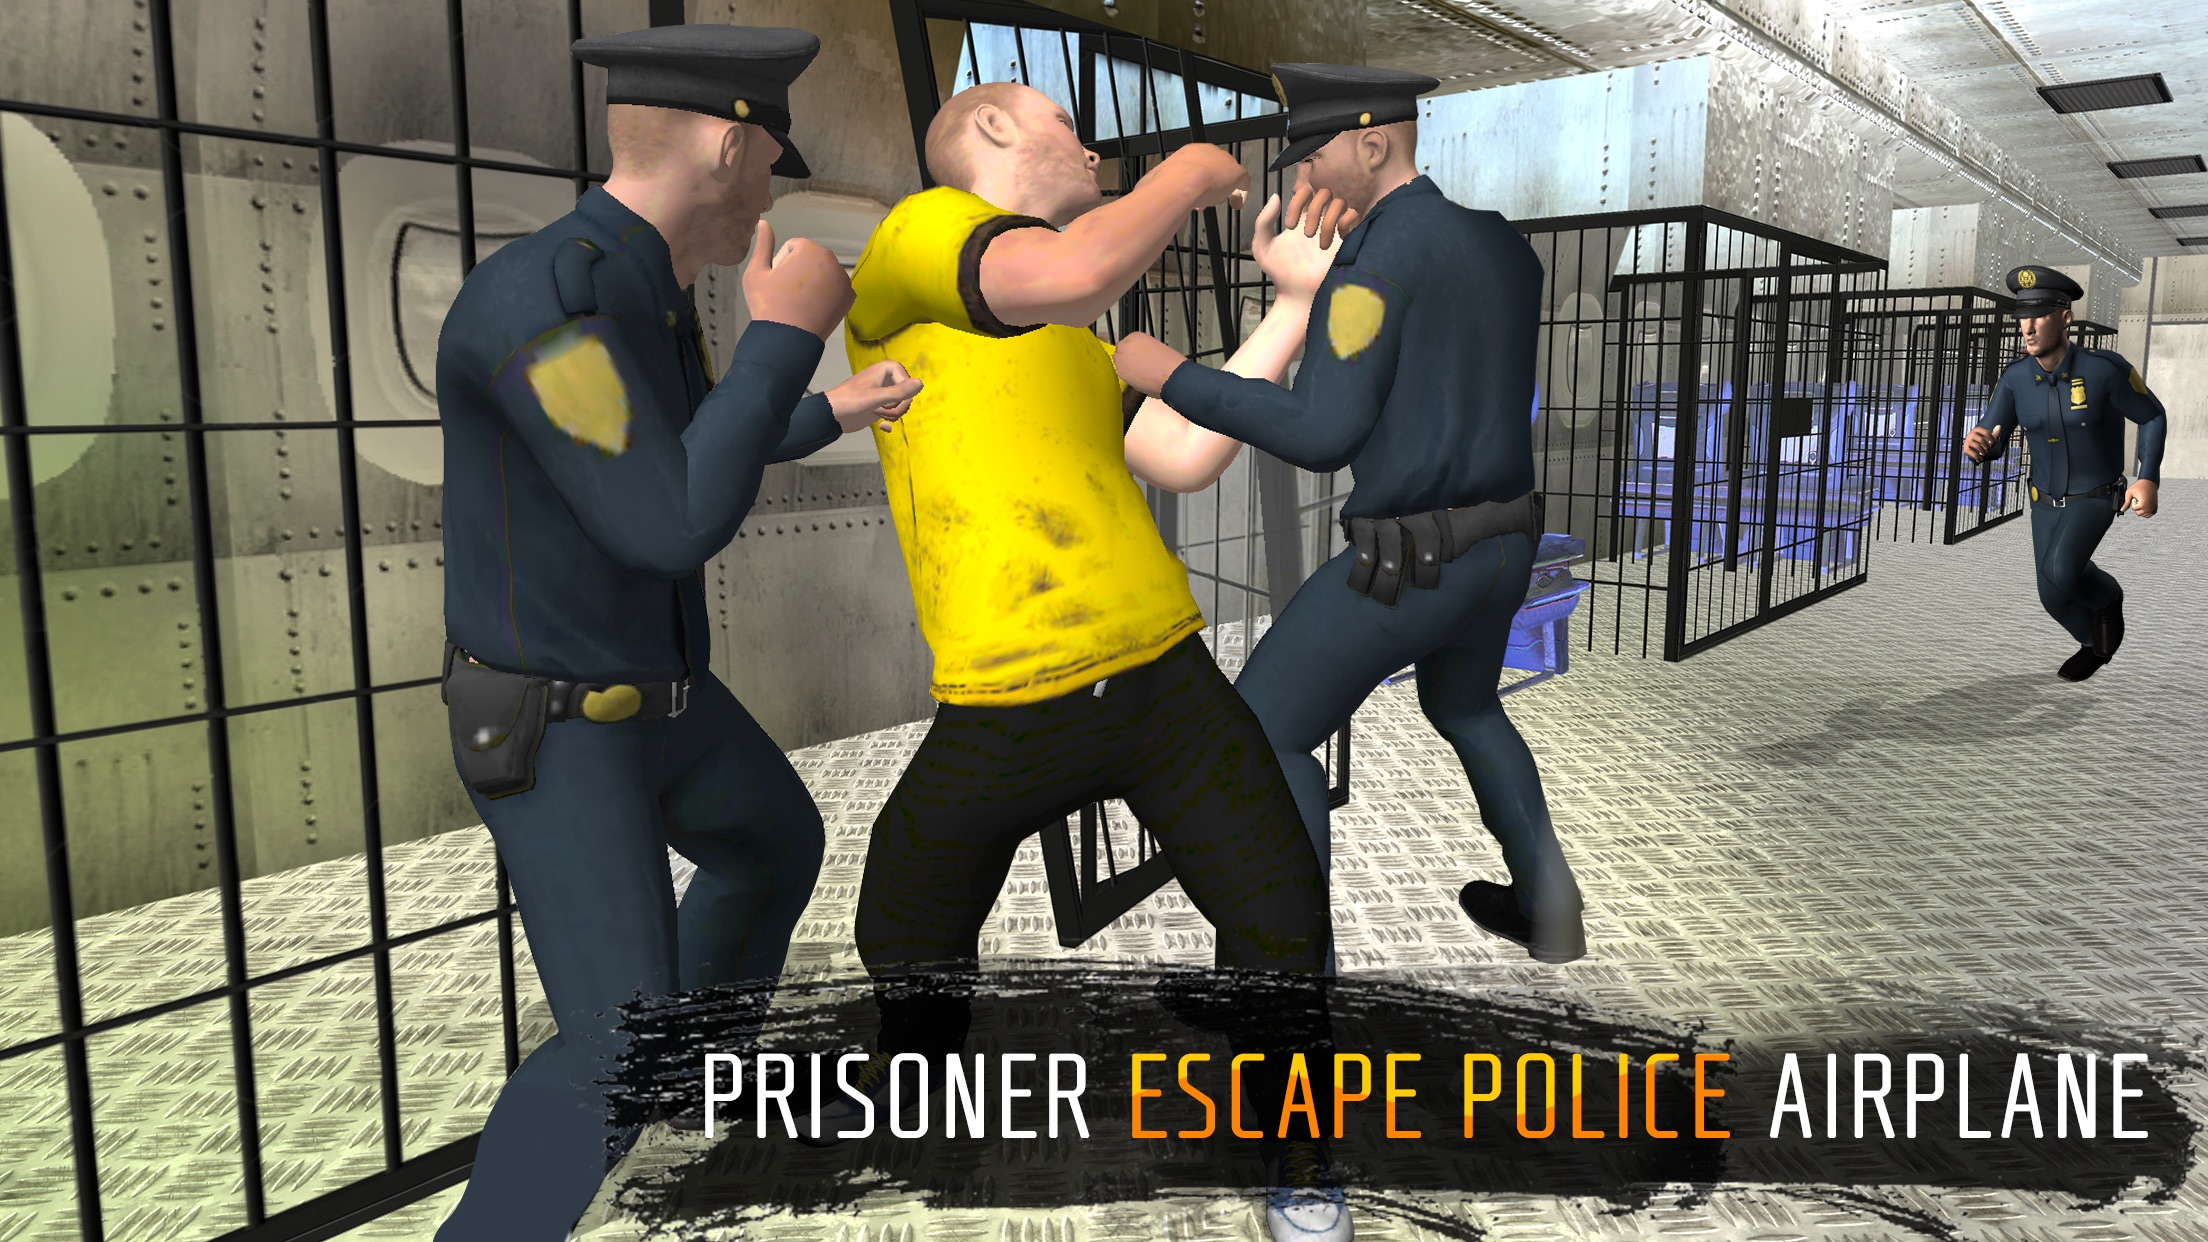 Prisoner Escape Police Airplane - Prison breakout mission in criminal transporter aircraft game Screenshot